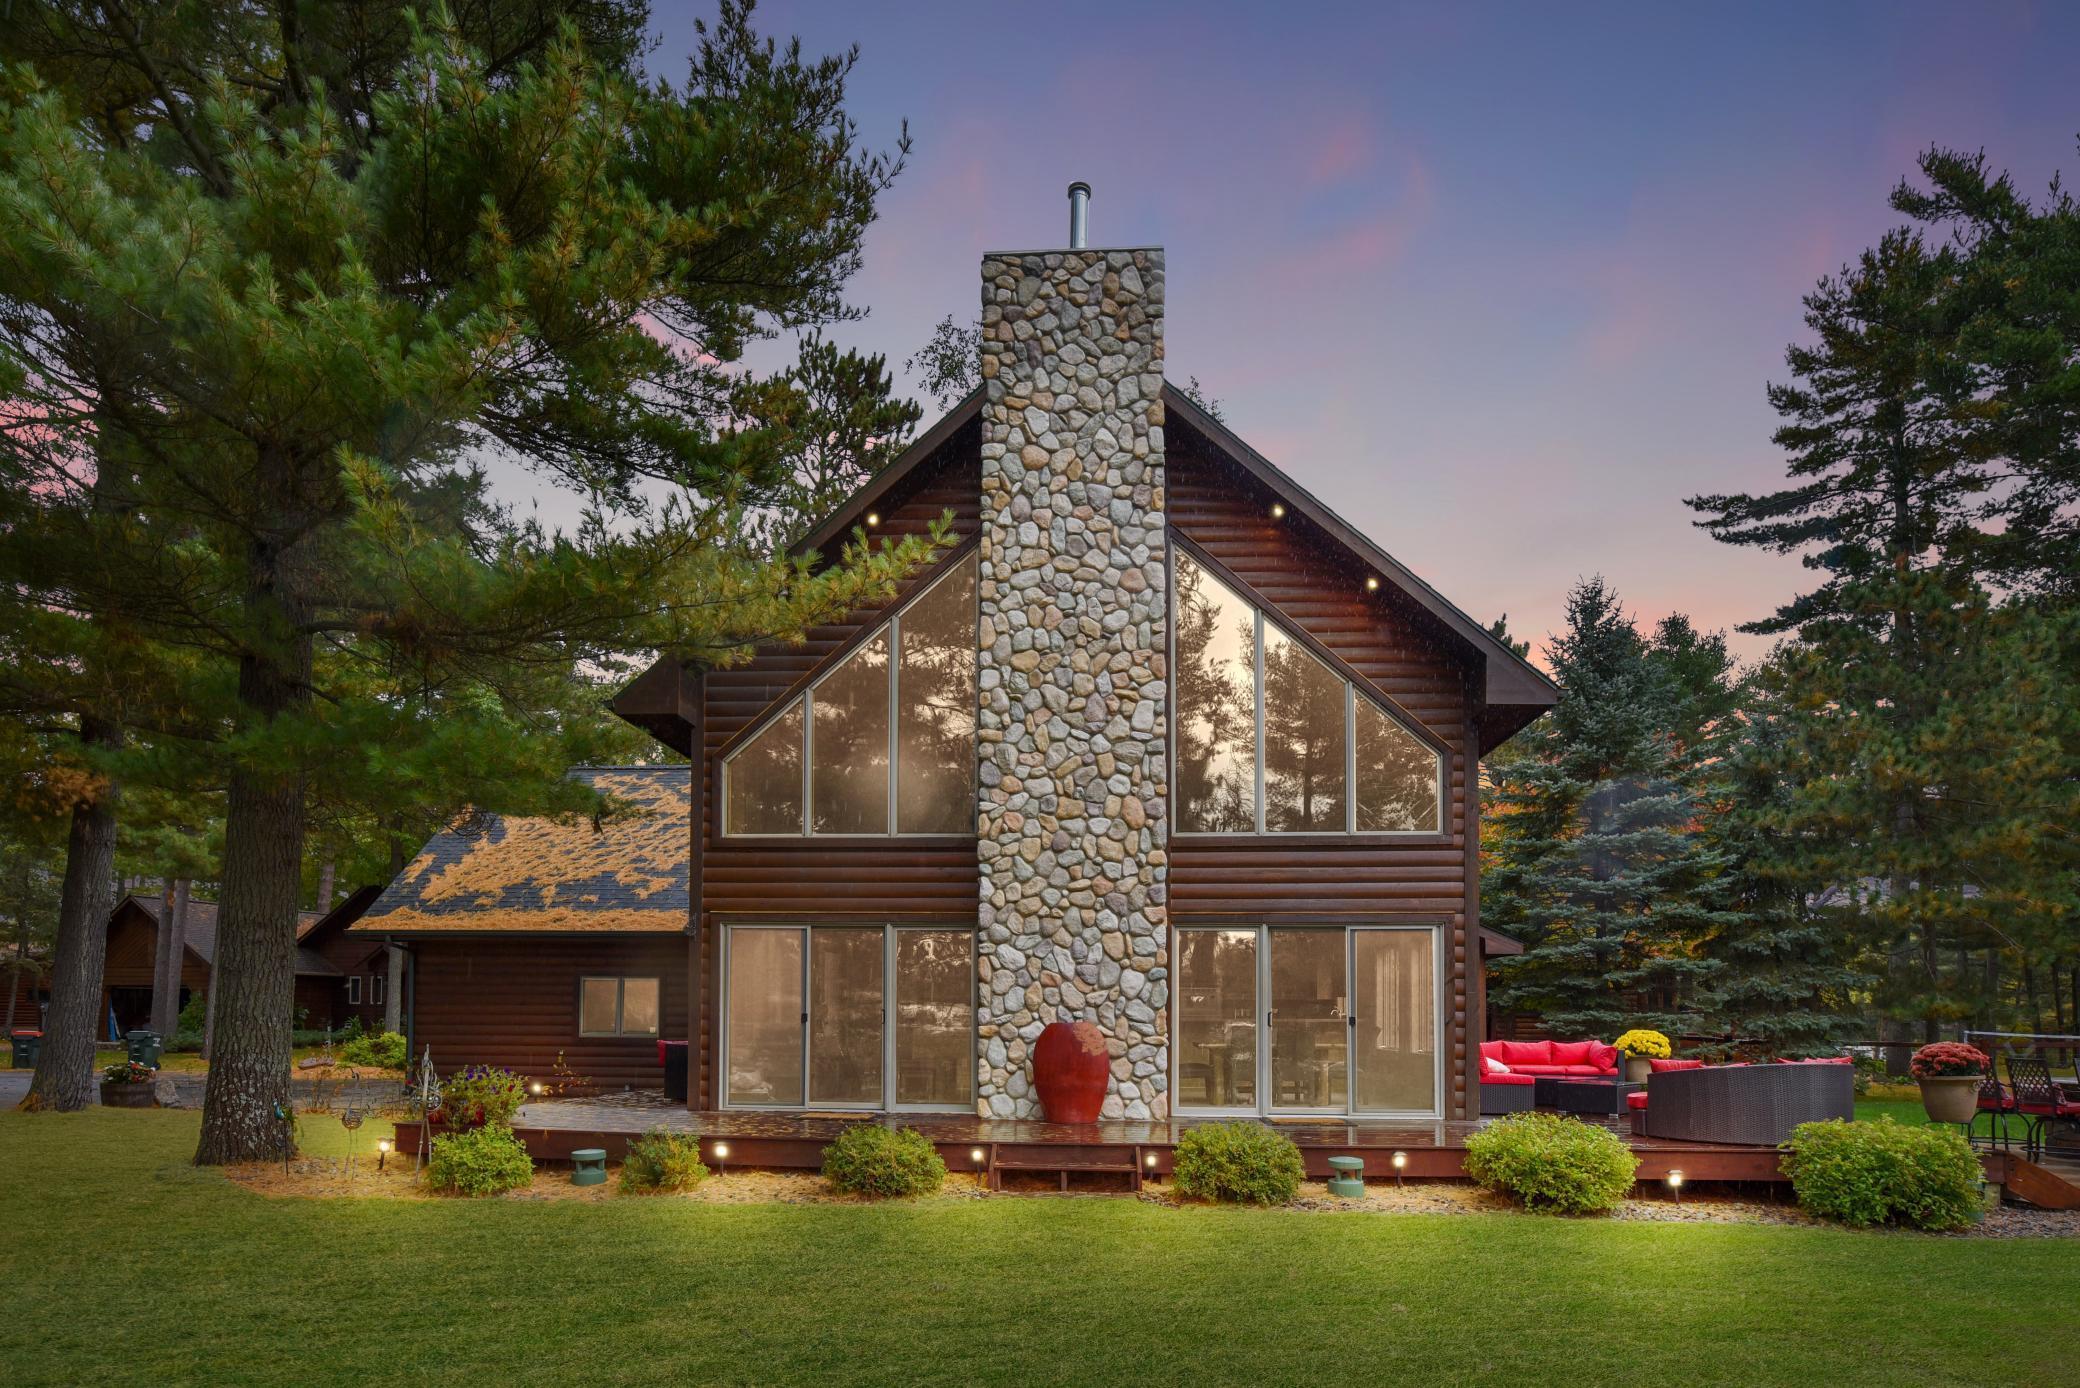 14037 Autumn Ridge Road Property Photo - Crosslake, MN real estate listing